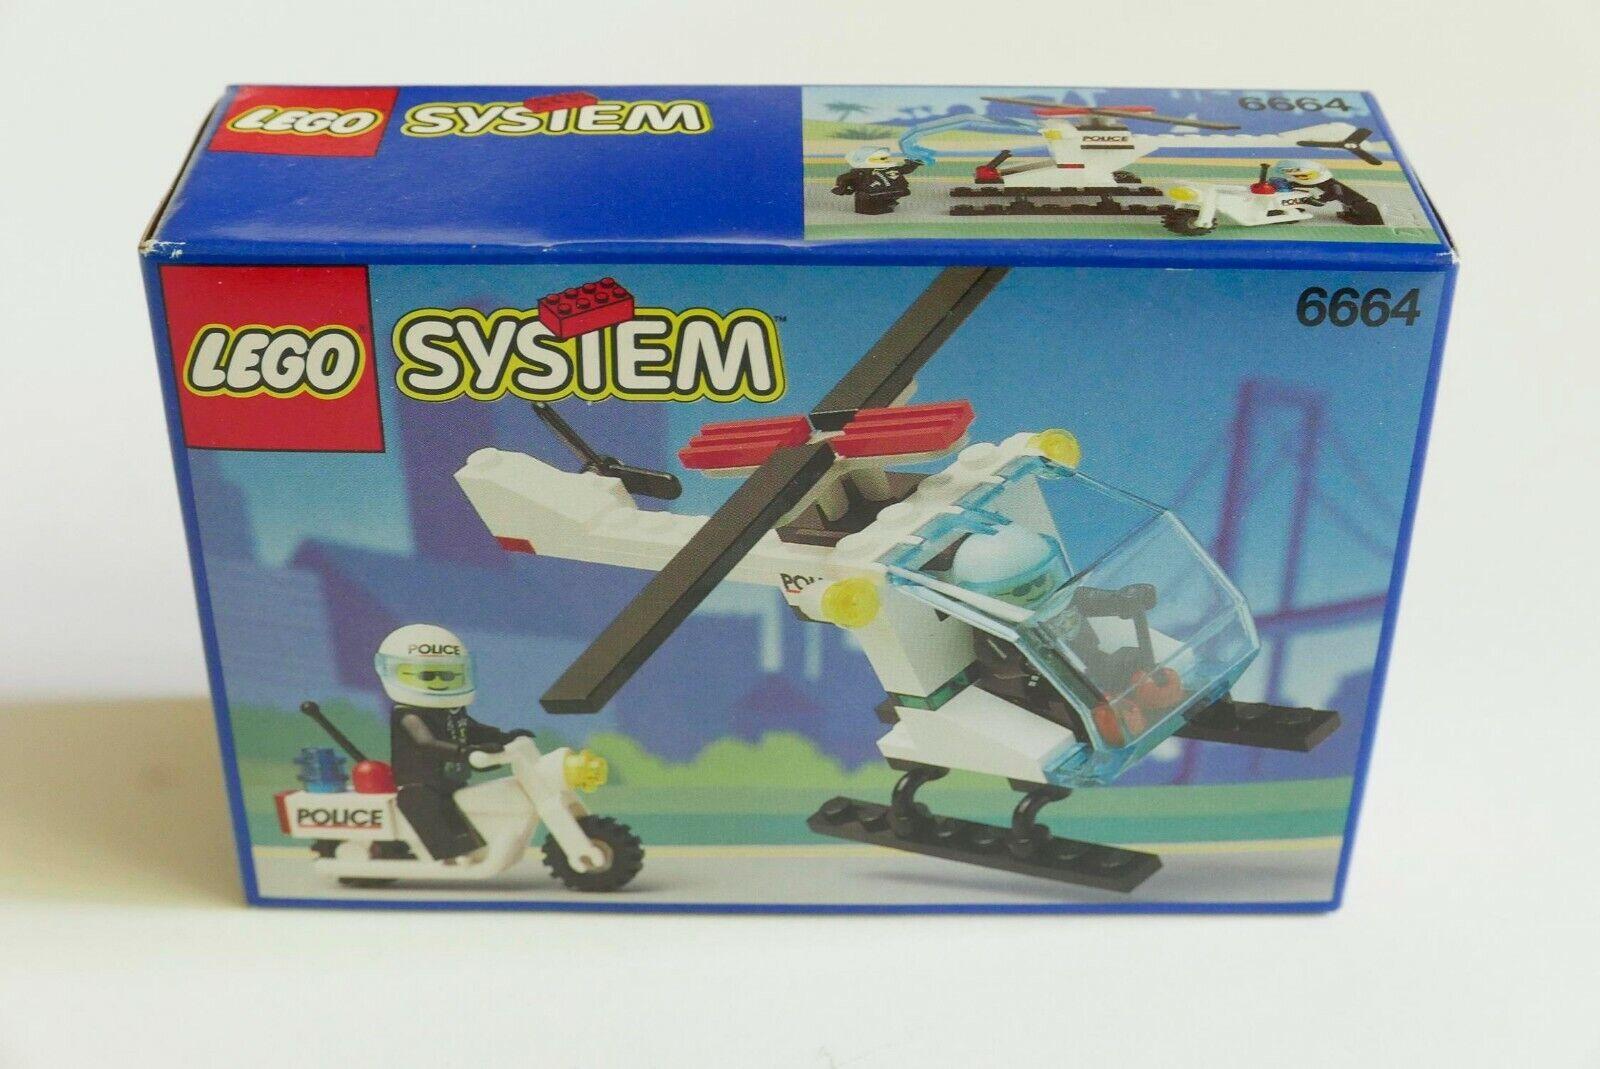 LEGO System Town 6664 Chopper Cops NEW Sealed RARE Vintage MISB MINT